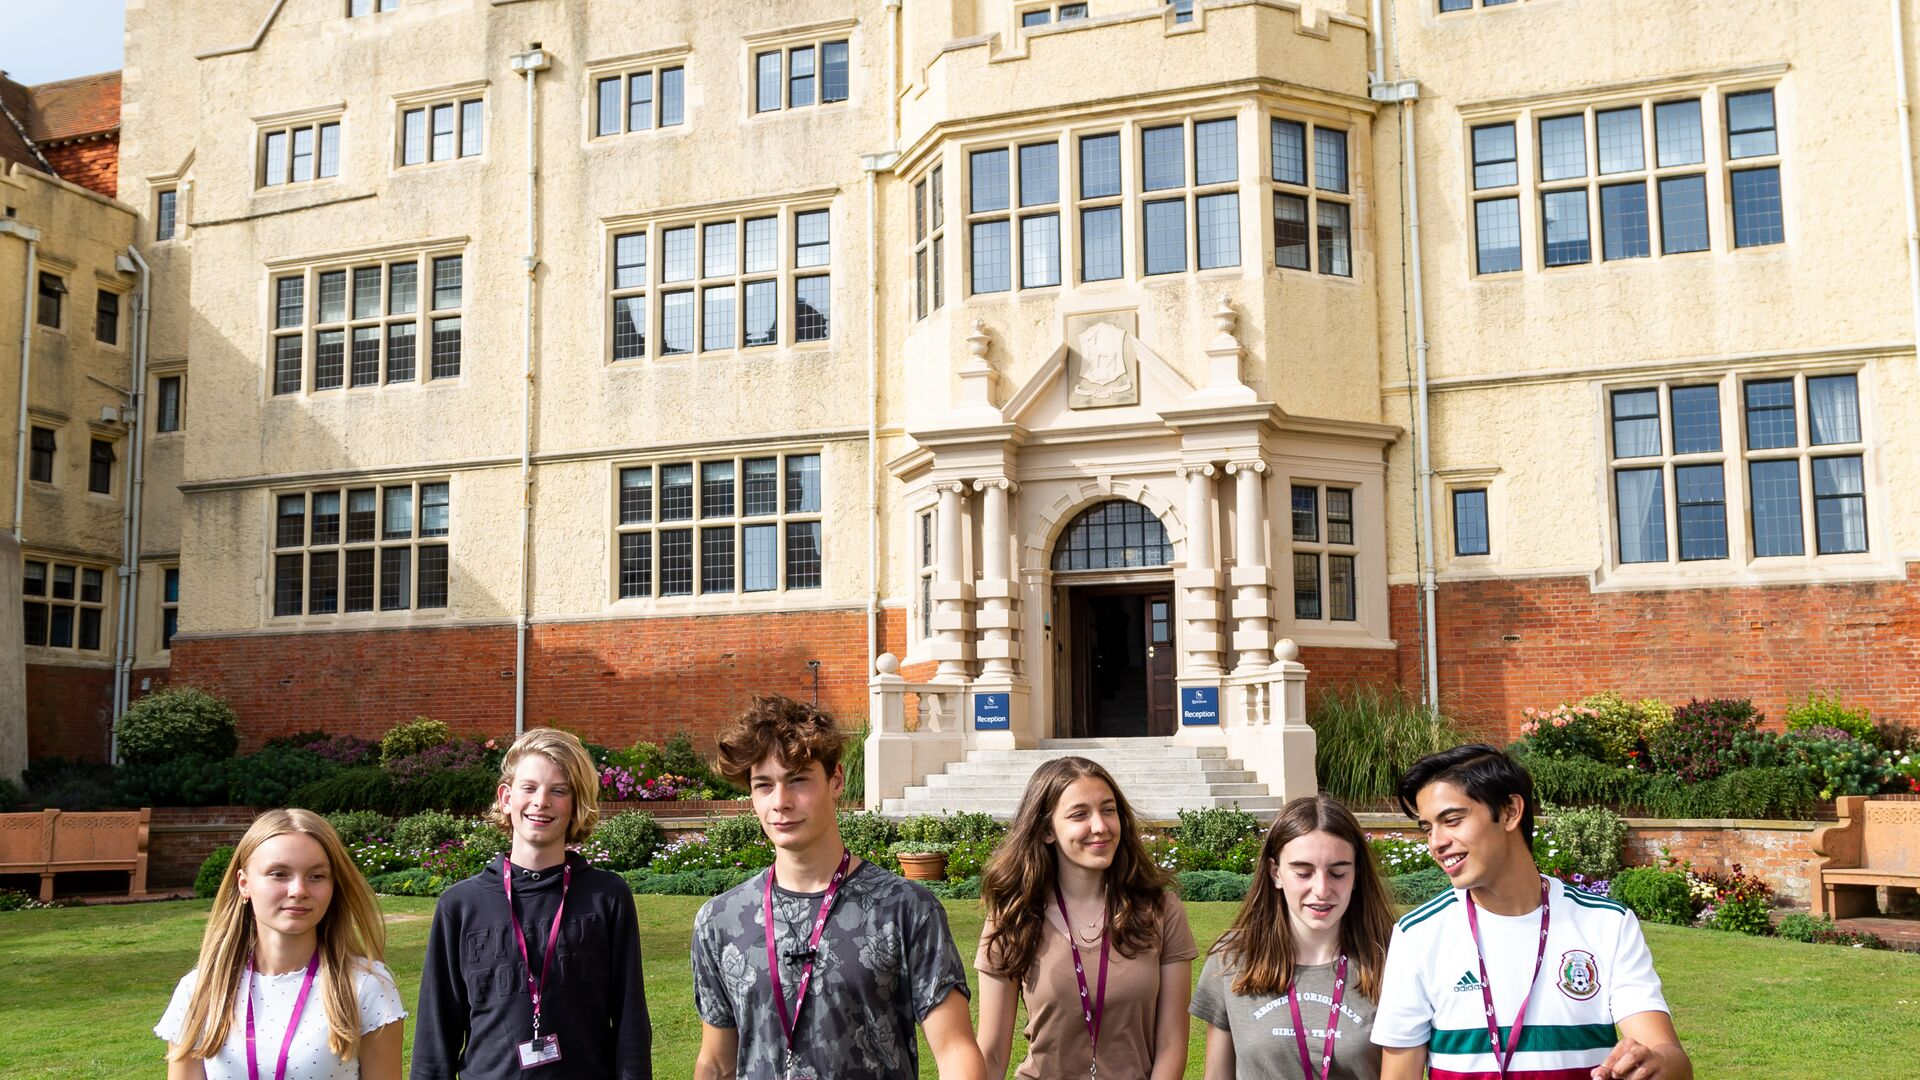 Sprachaufenthalt England, Brighton - EC Brighton Young Learners - Studenten